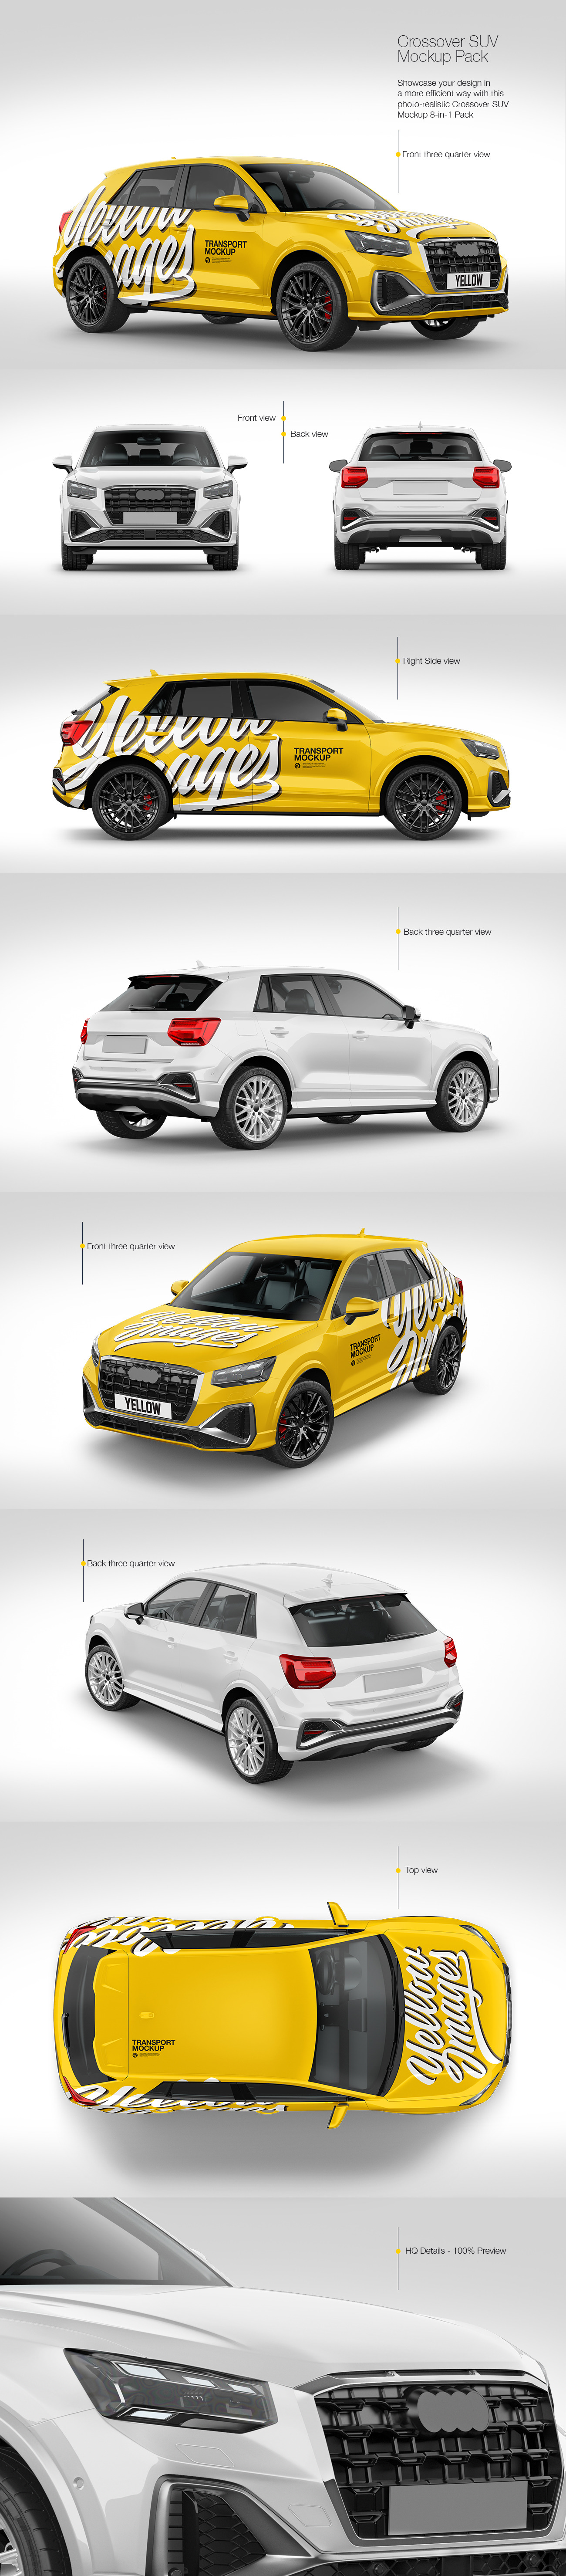 Luxury Crossover SUV Mockup Pack